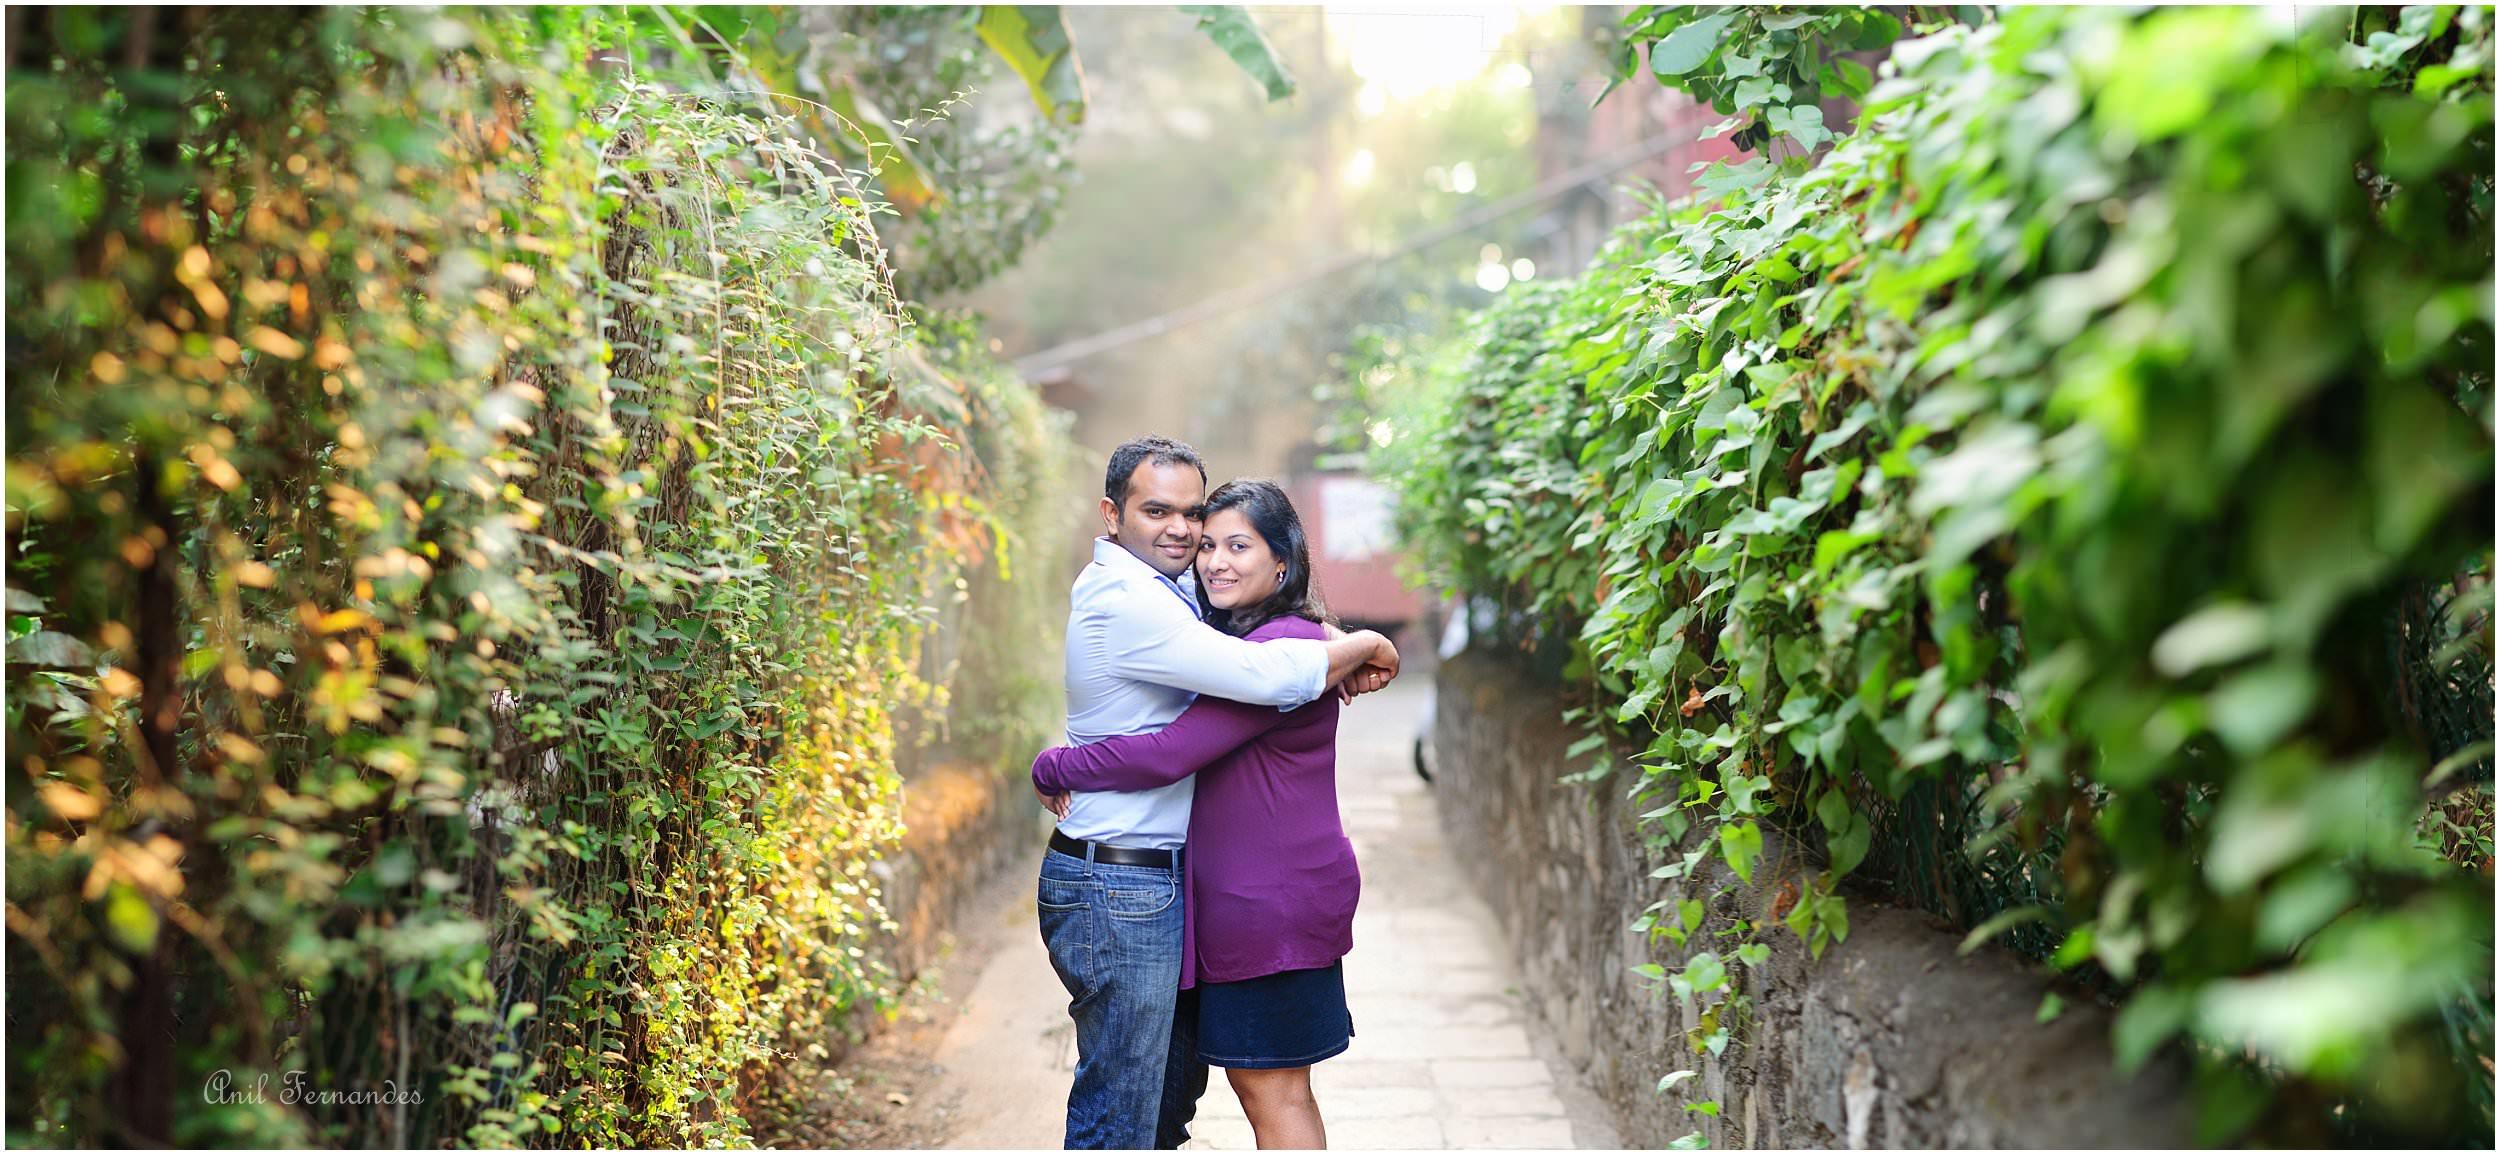 Post wedding couple photo Mumbai a